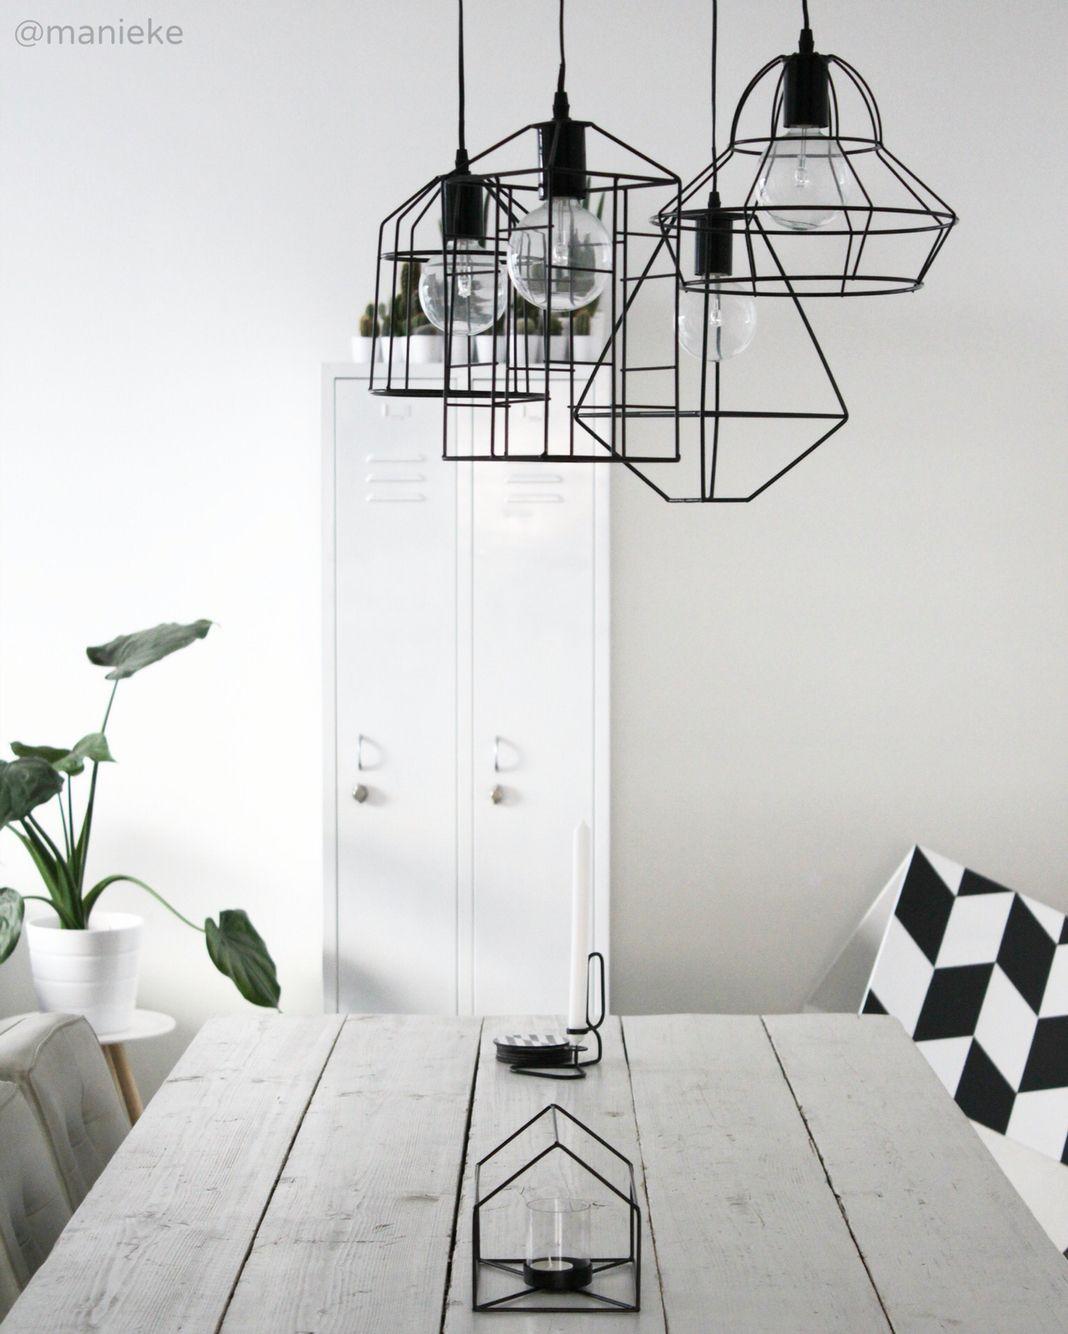 My home | Interior | Livingroom | @manieke | Renos | Pinterest ...